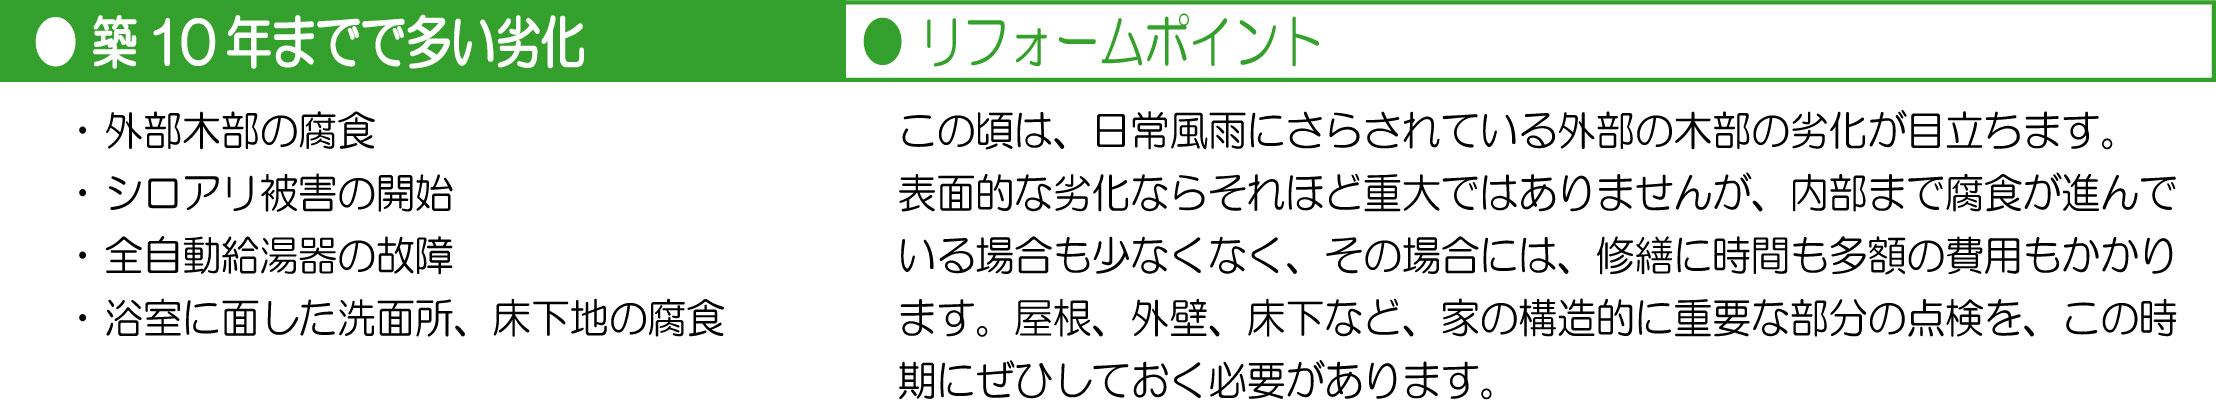 KuraSi-natu-sin65-07.jpg